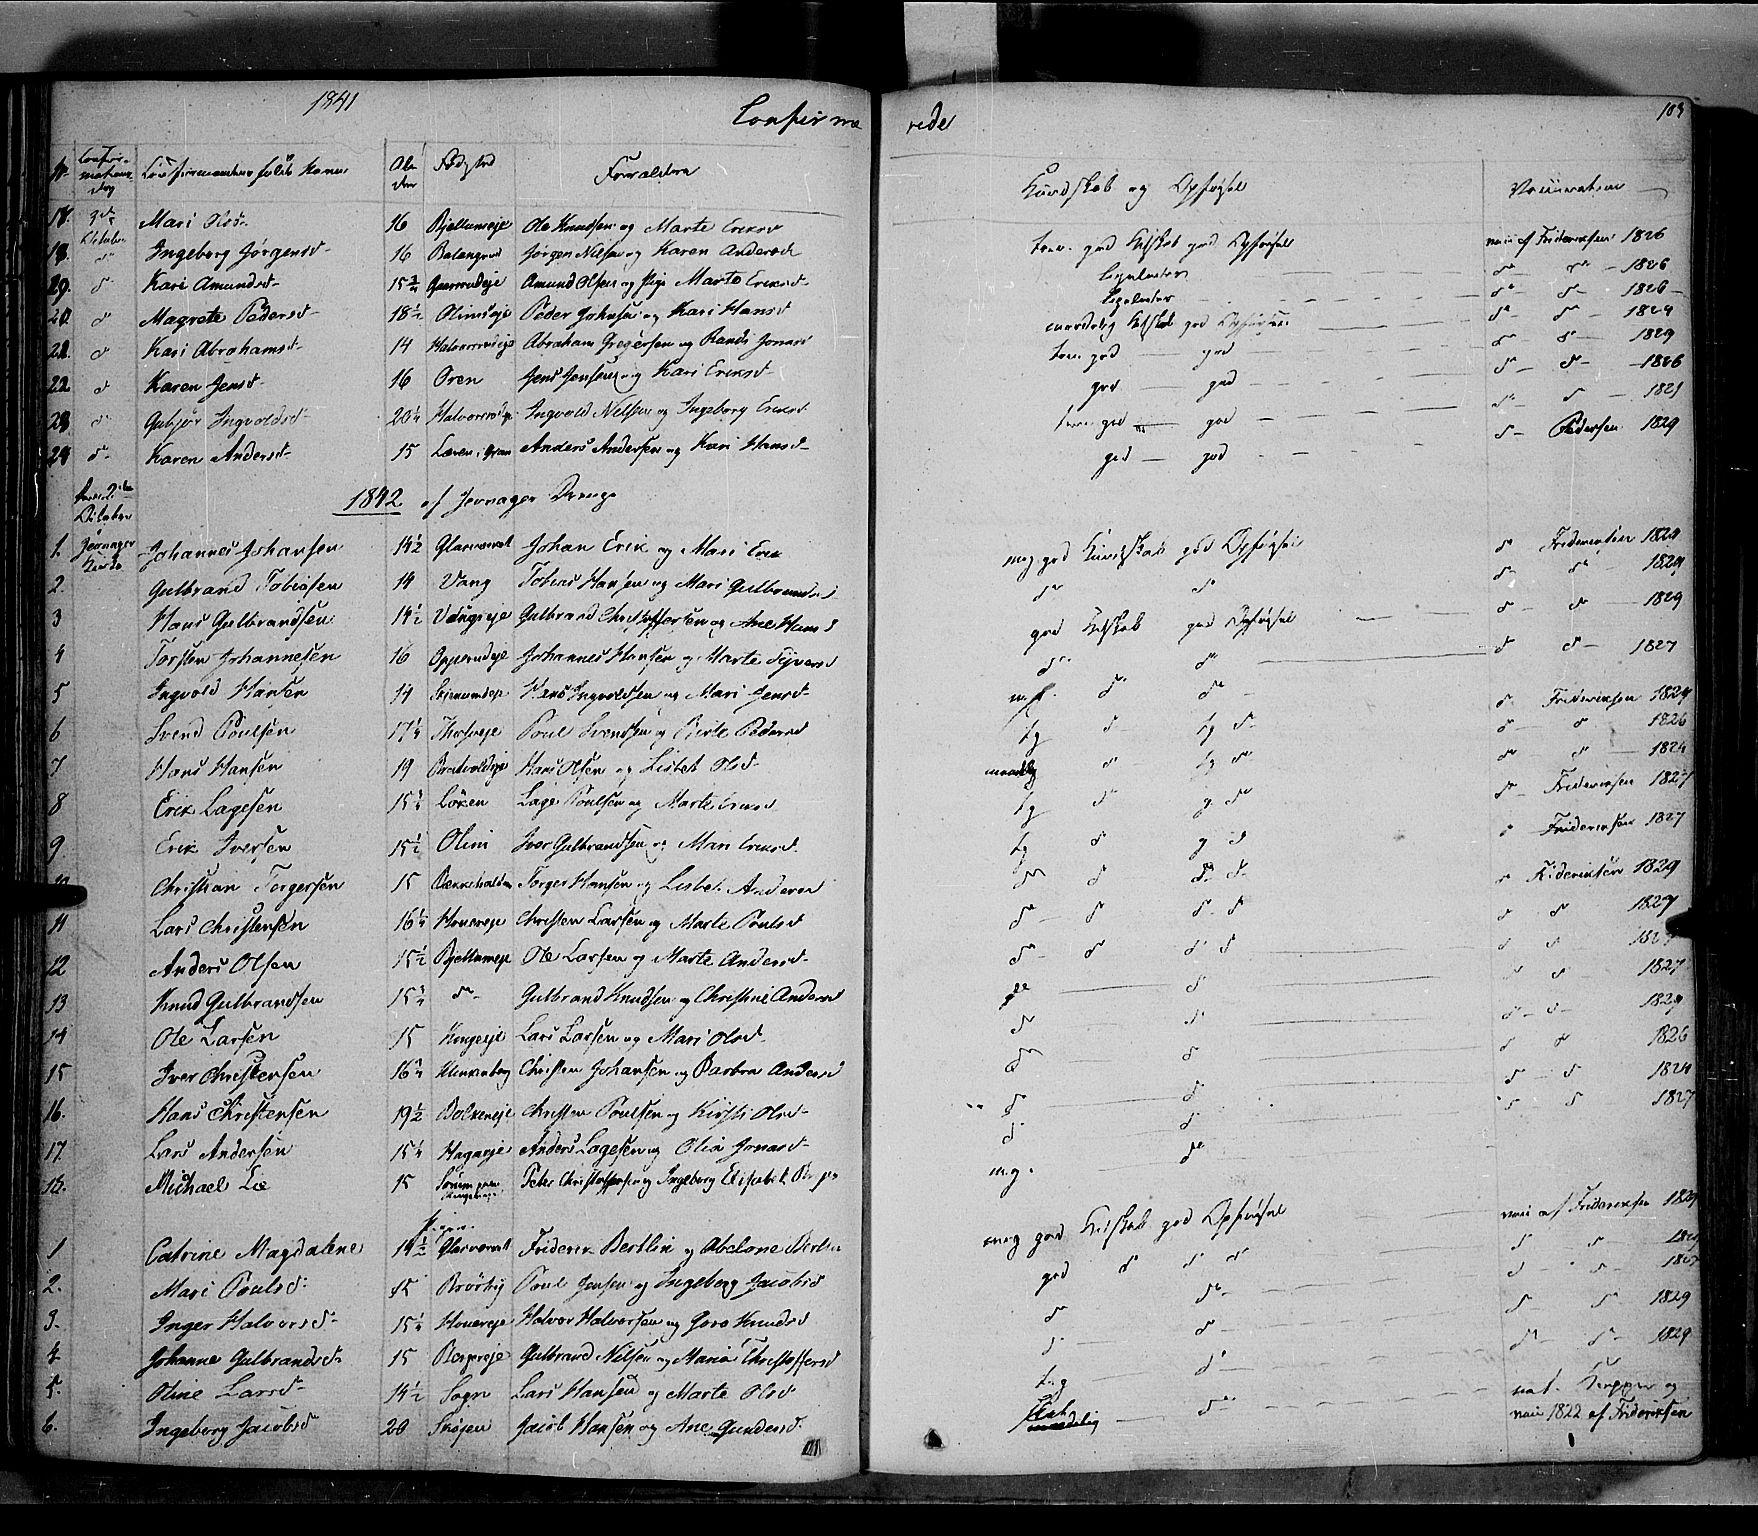 SAH, Jevnaker prestekontor, Ministerialbok nr. 6, 1837-1857, s. 103